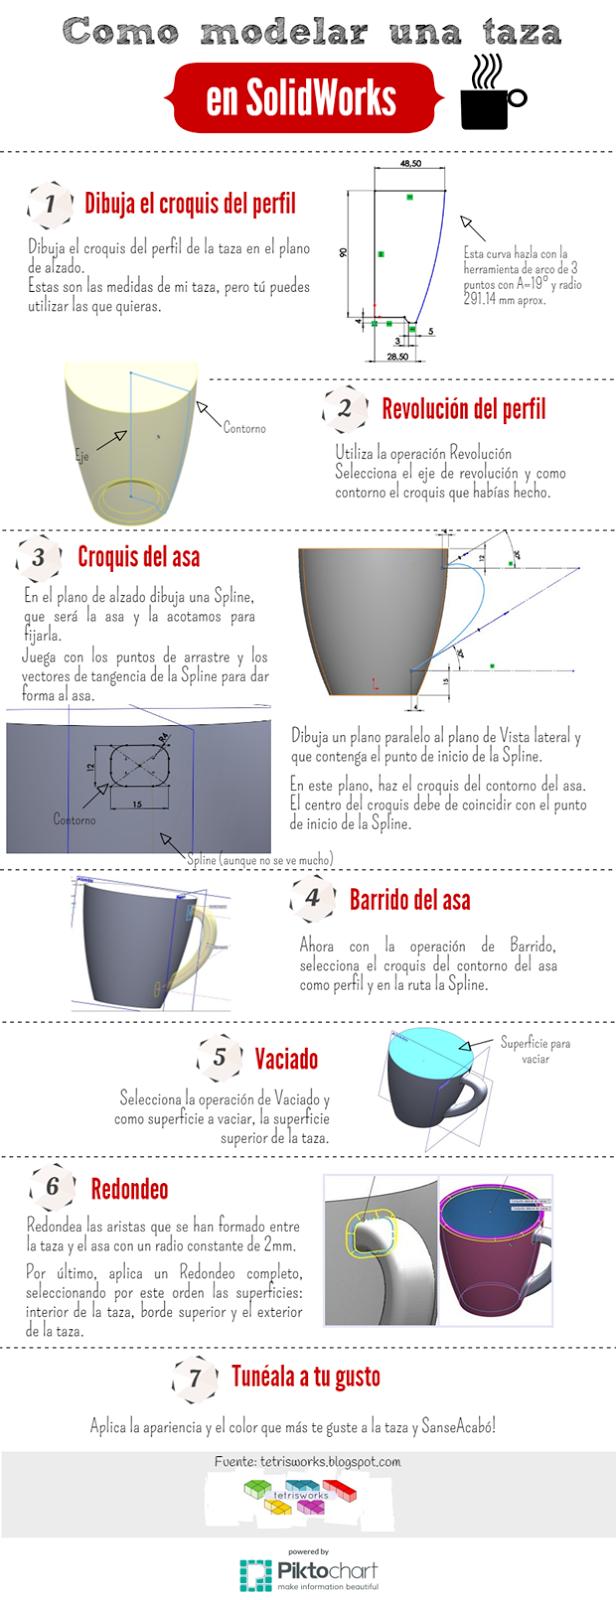 Infografia sobre como modelar una taza en Solidworks